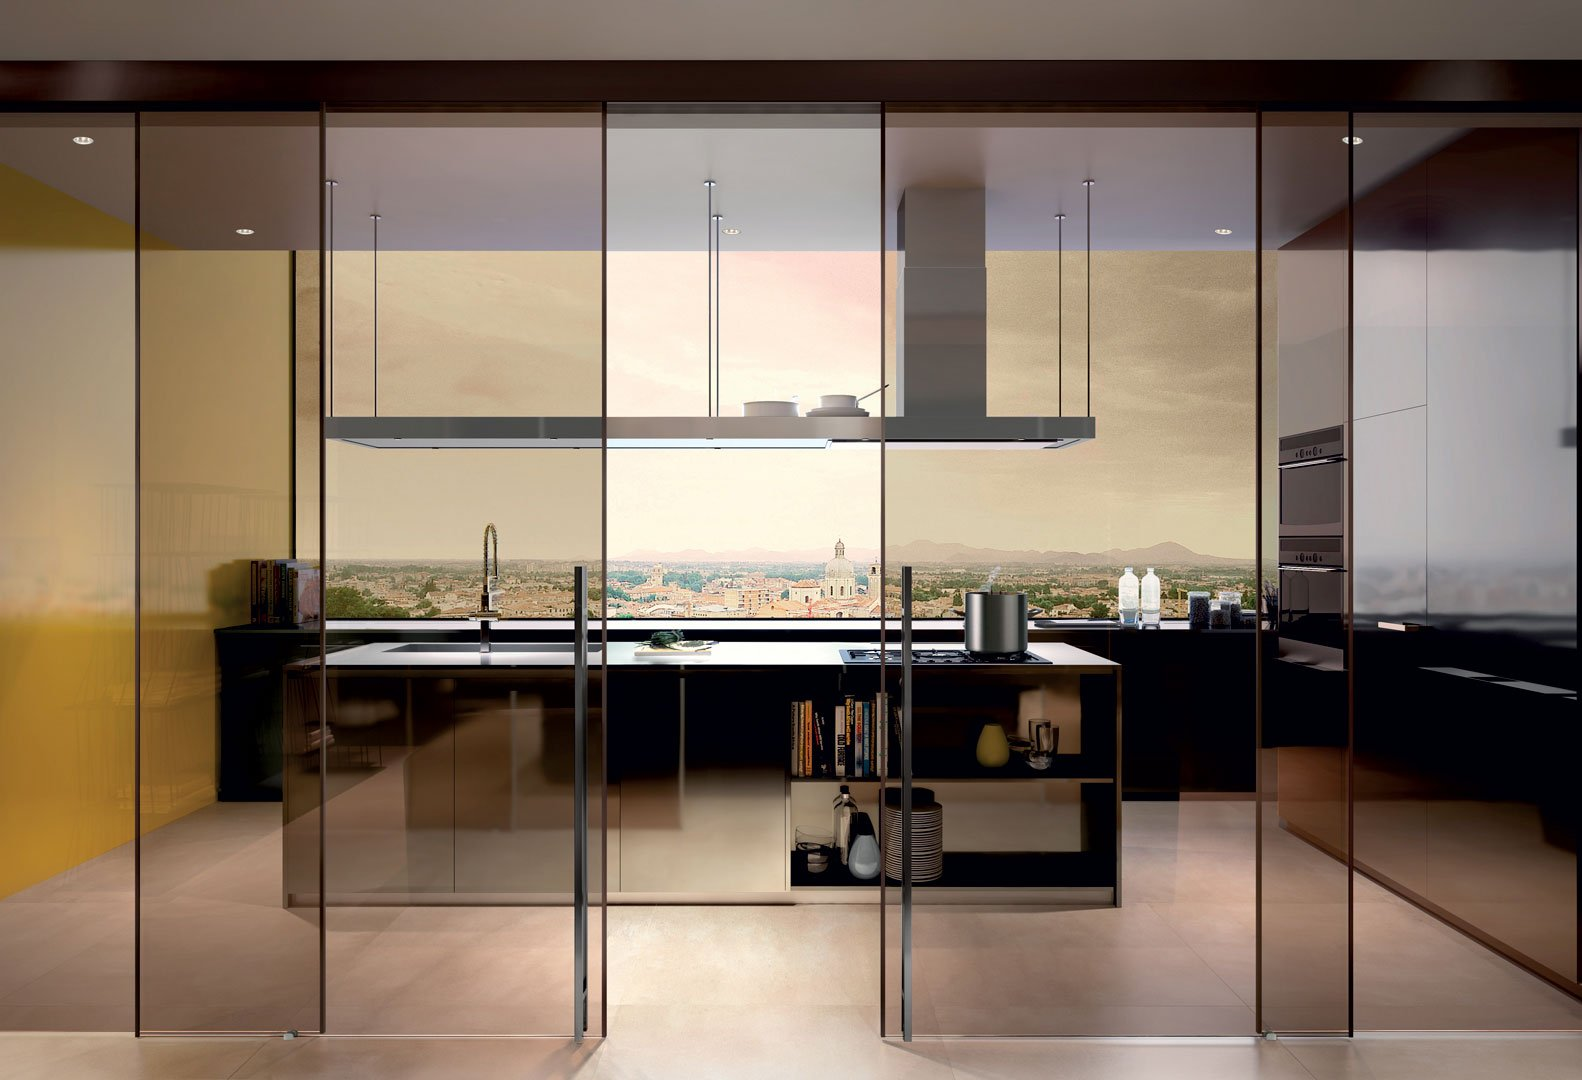 Porte vetro Henry Glass - cucina-bronzo - Tecnoinfissi Srl